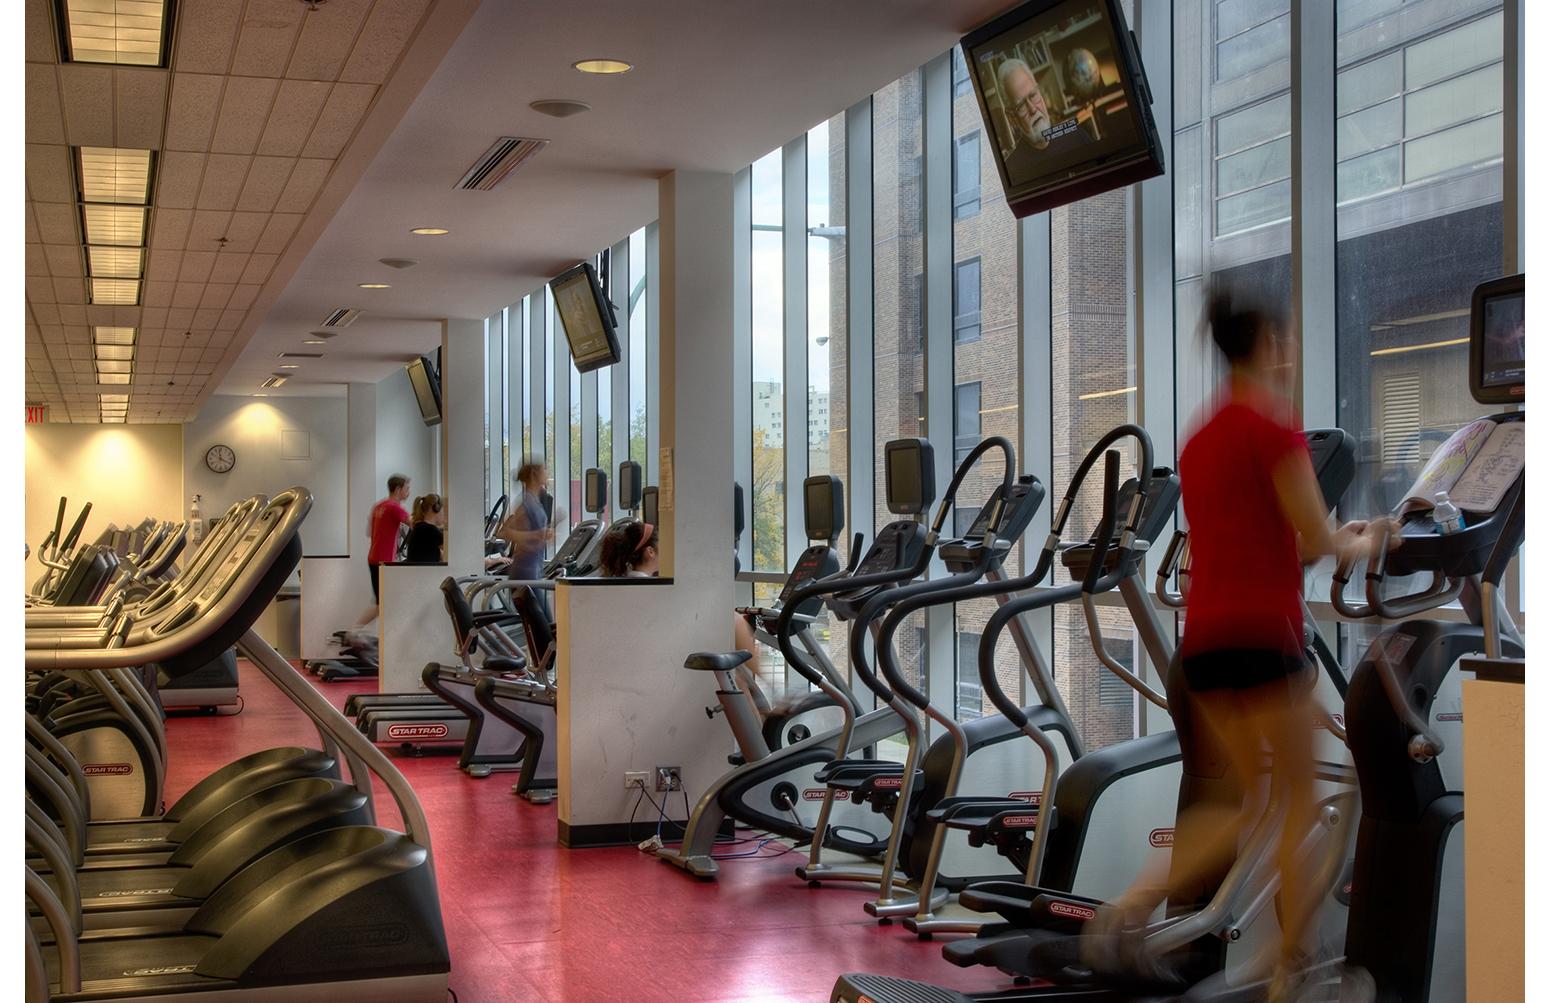 Duckworth Centre, interior photo of workout area / Photo: Bryan Scott